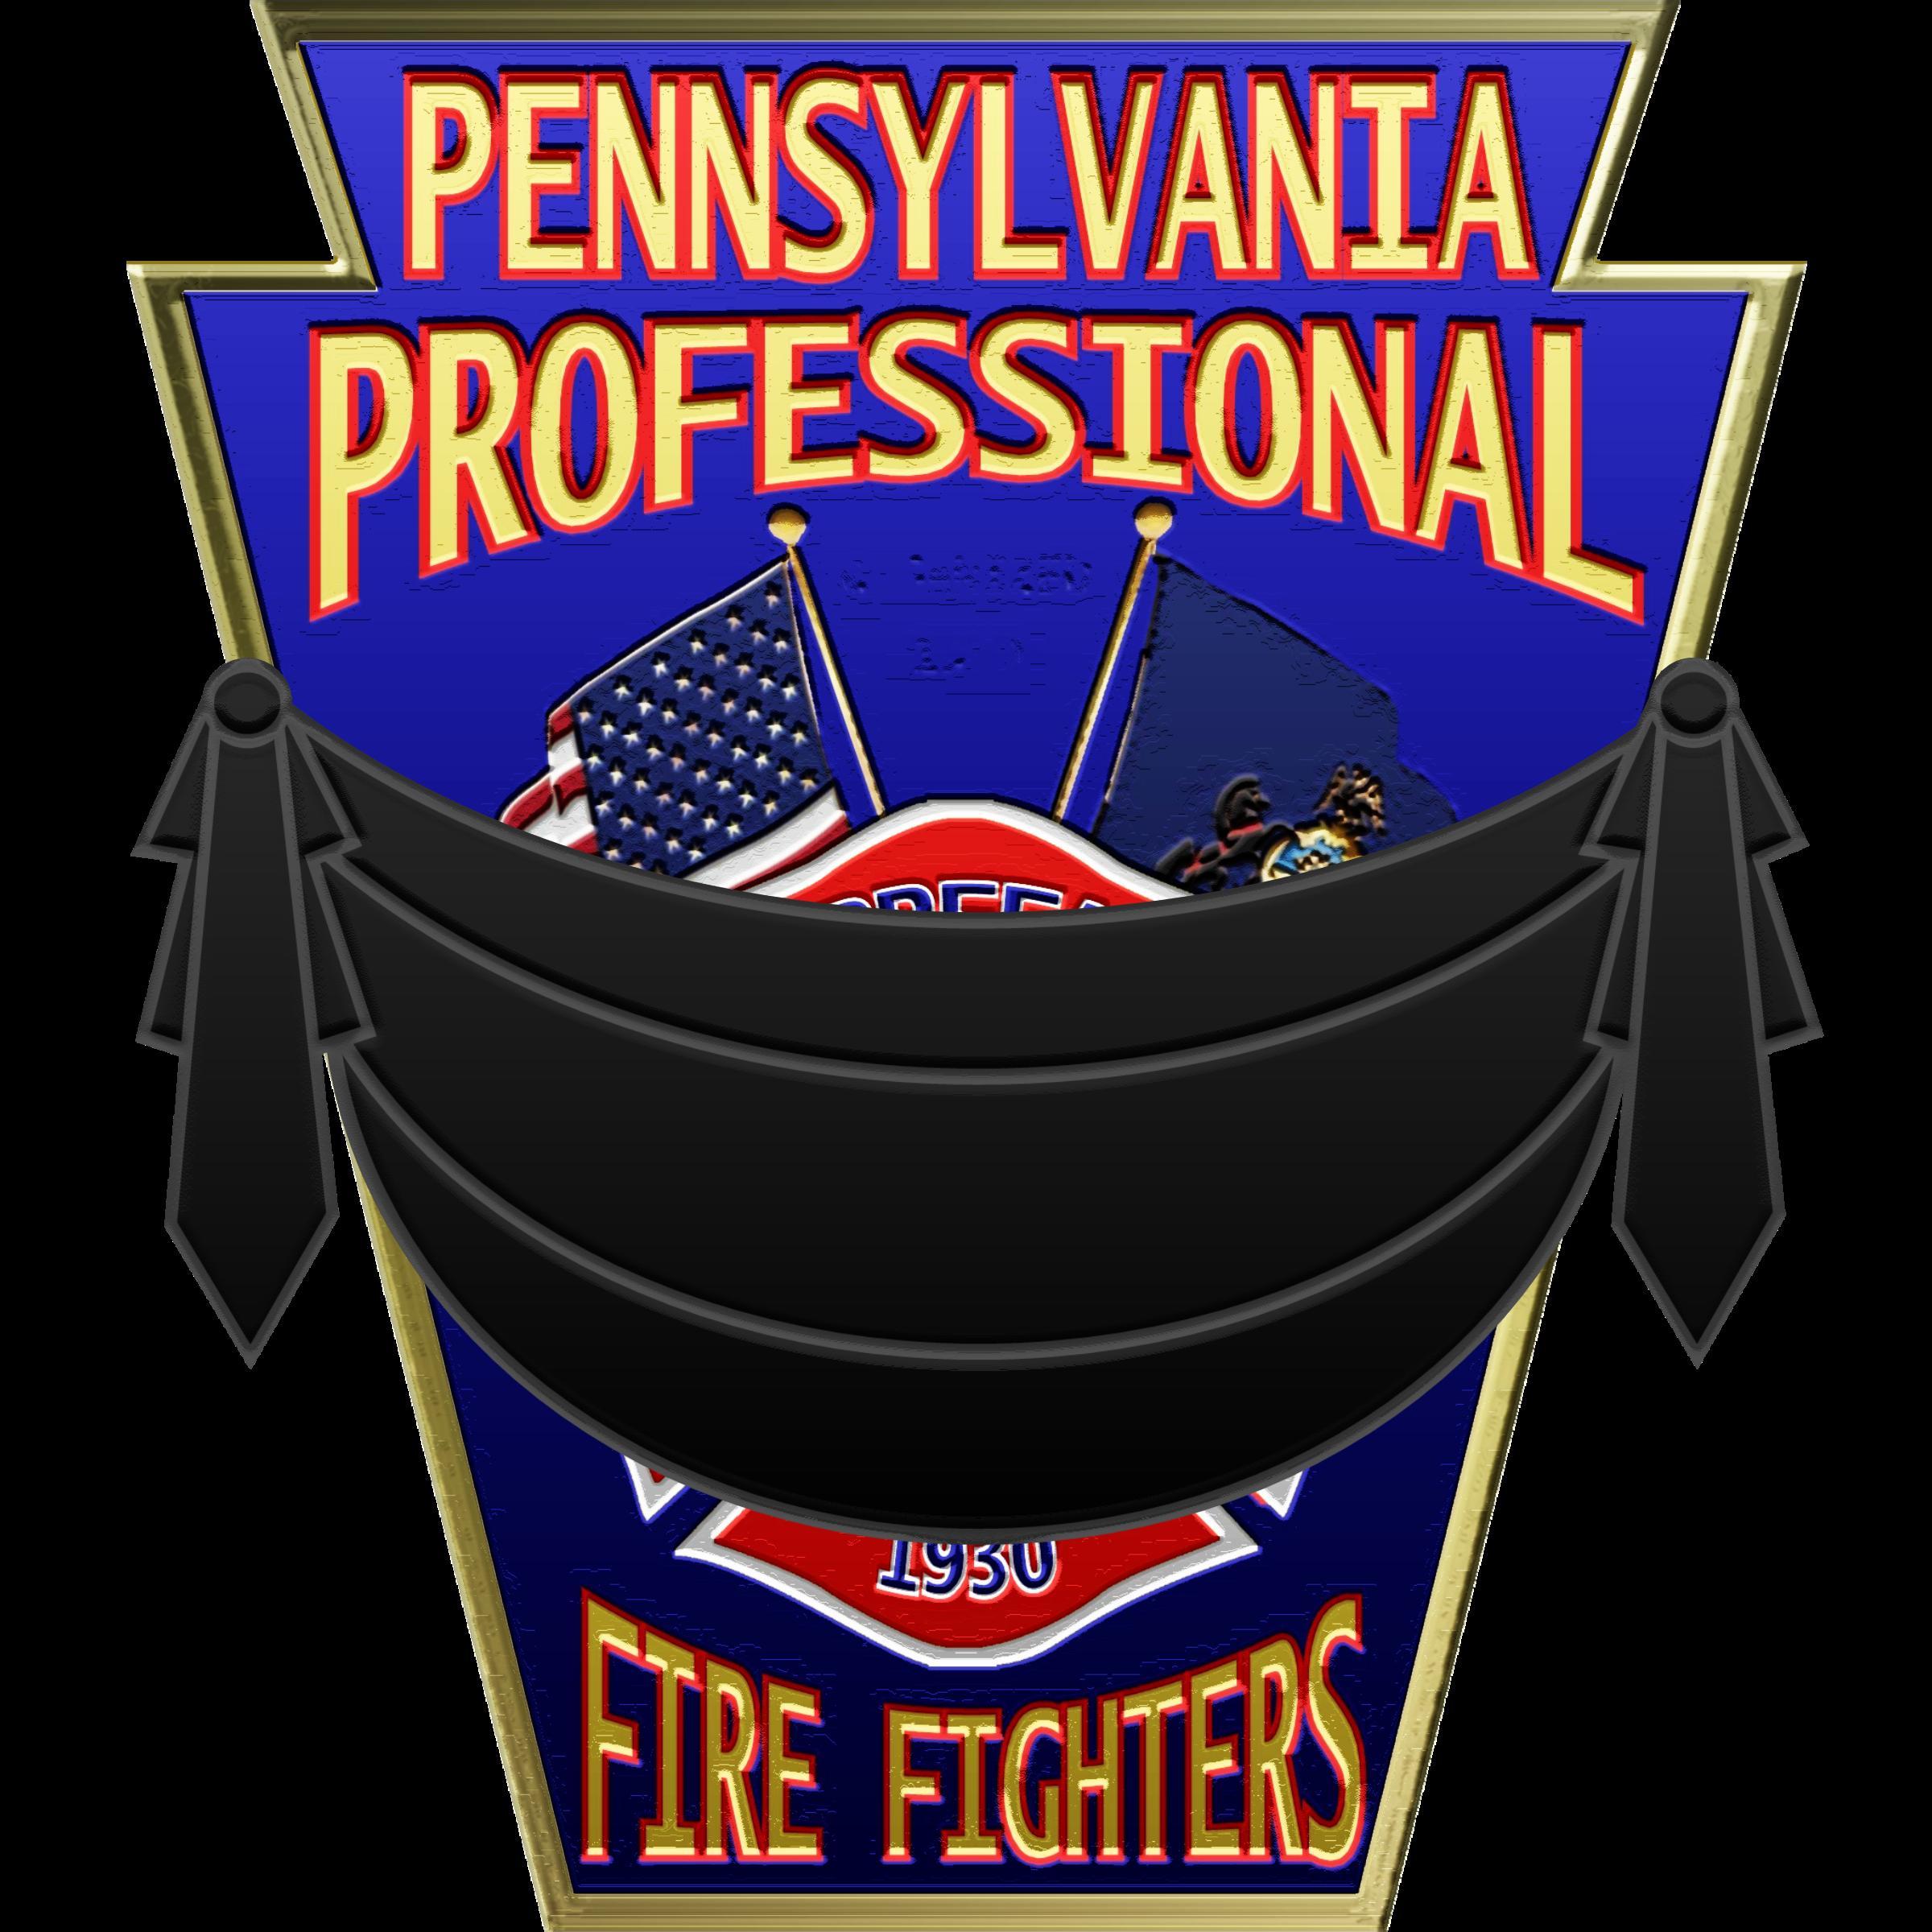 PPFFA Logo w/banner  PPFFA Logo with black mourning banner